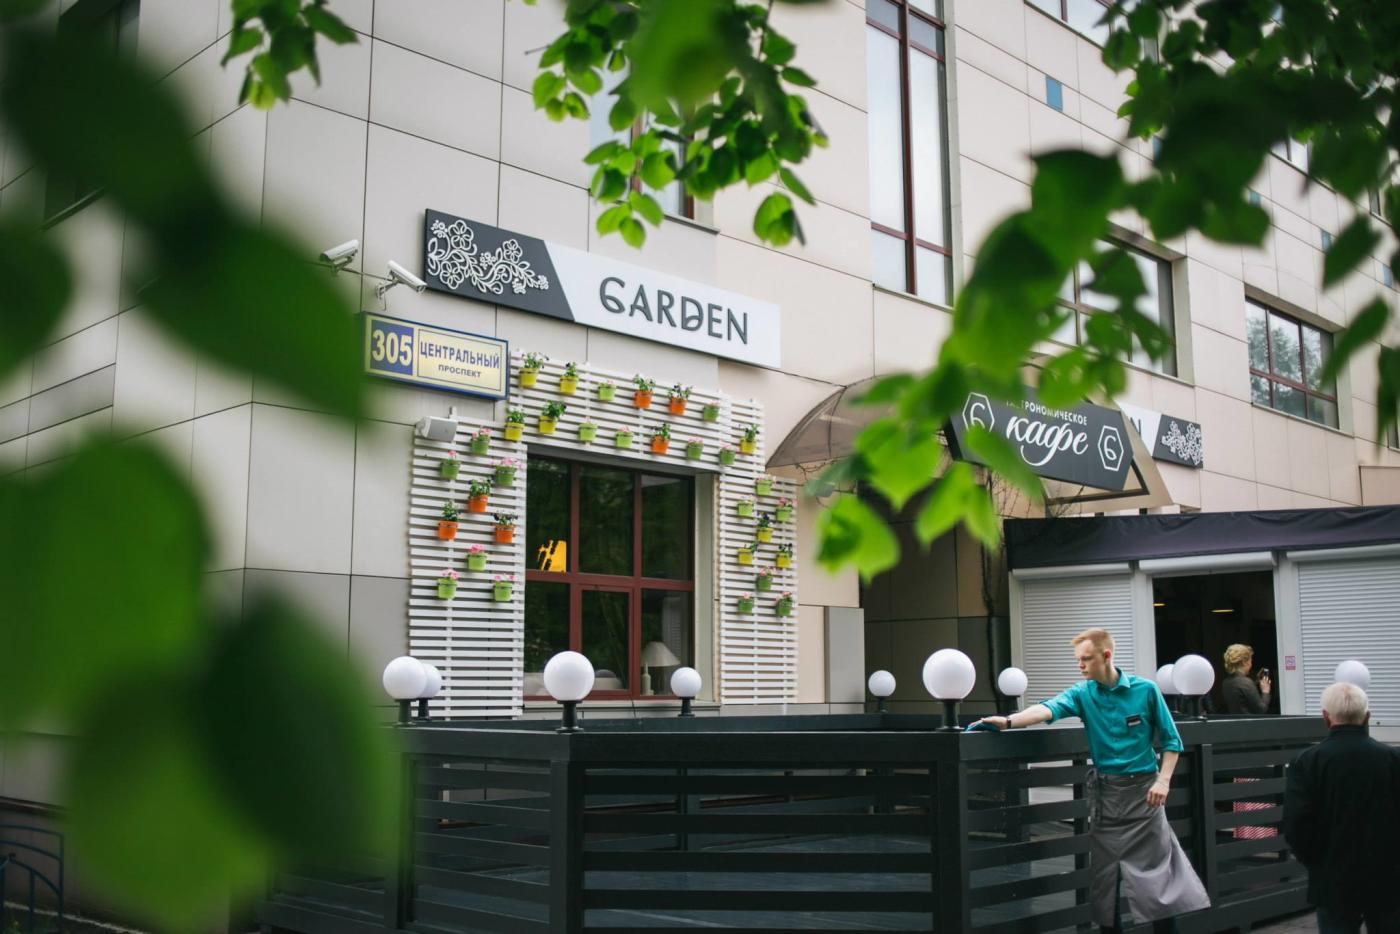 Кафе Гарден в Зеленограде (Garden) фото 18